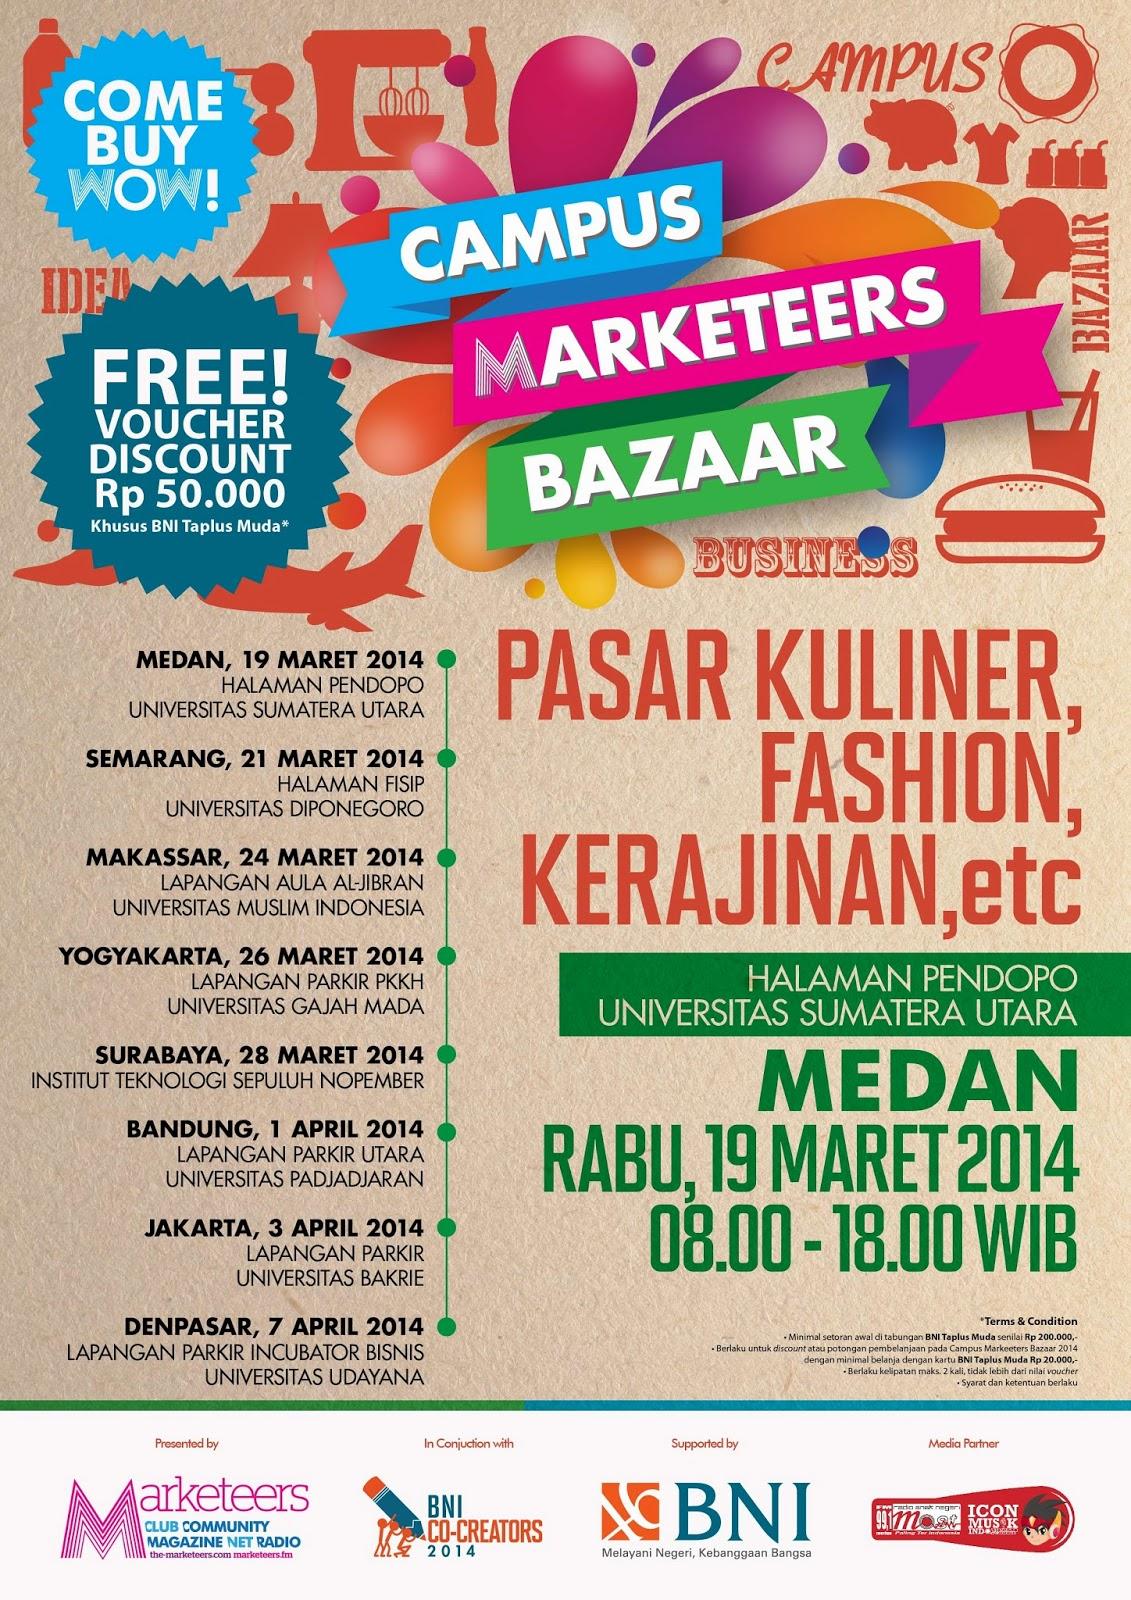 Campus Marketeers Bazaar di USU